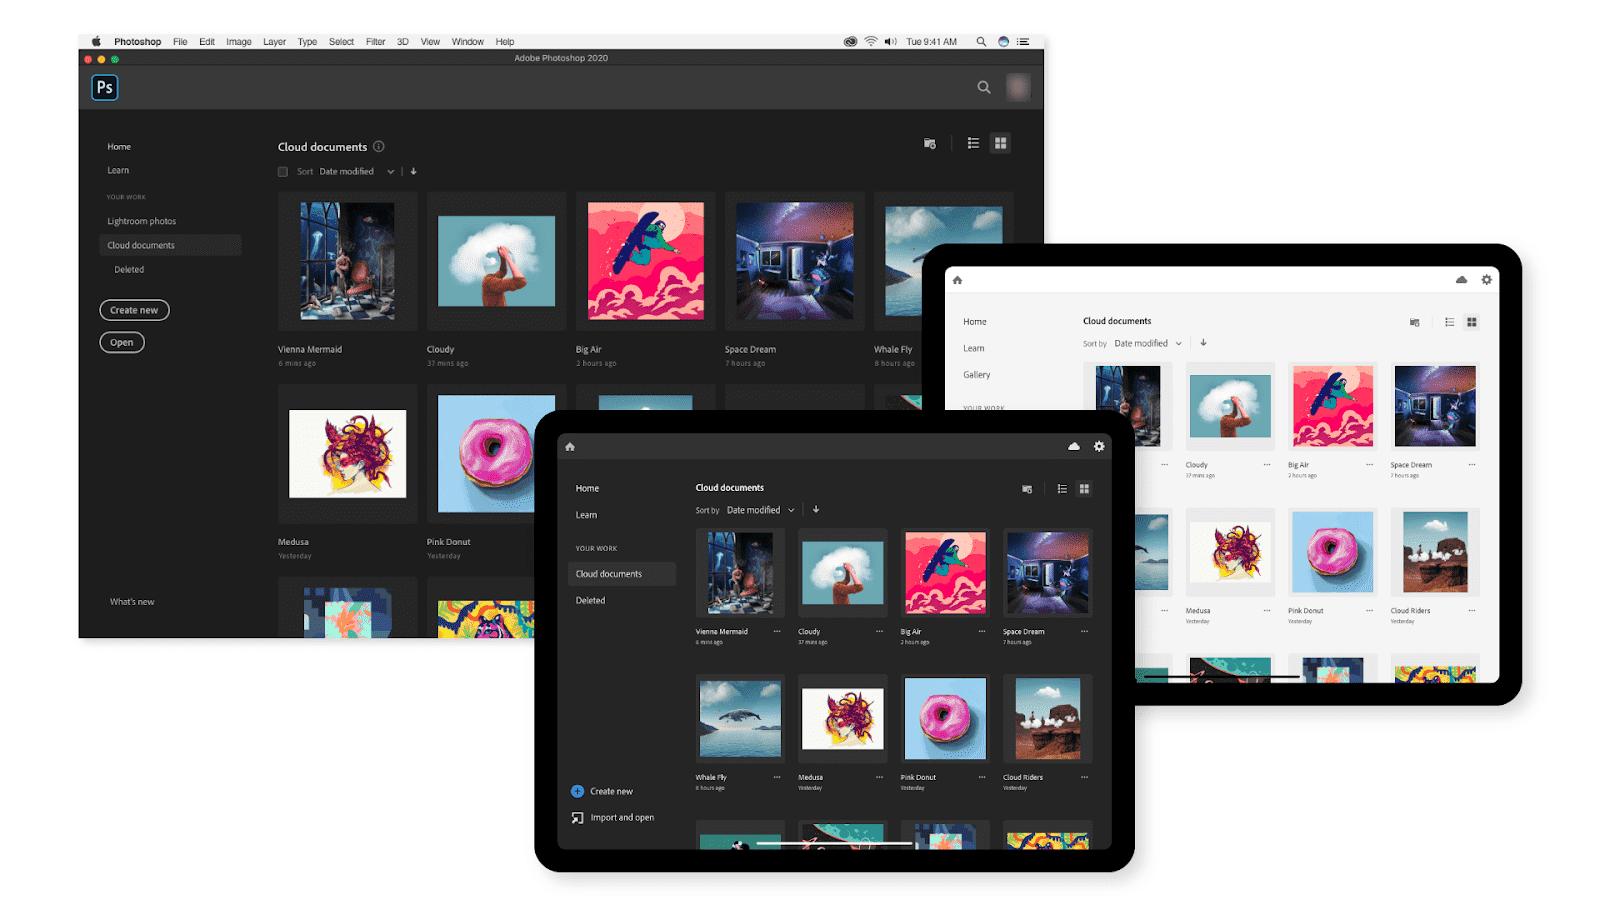 Photoshop 2020 Mac Released Img 1